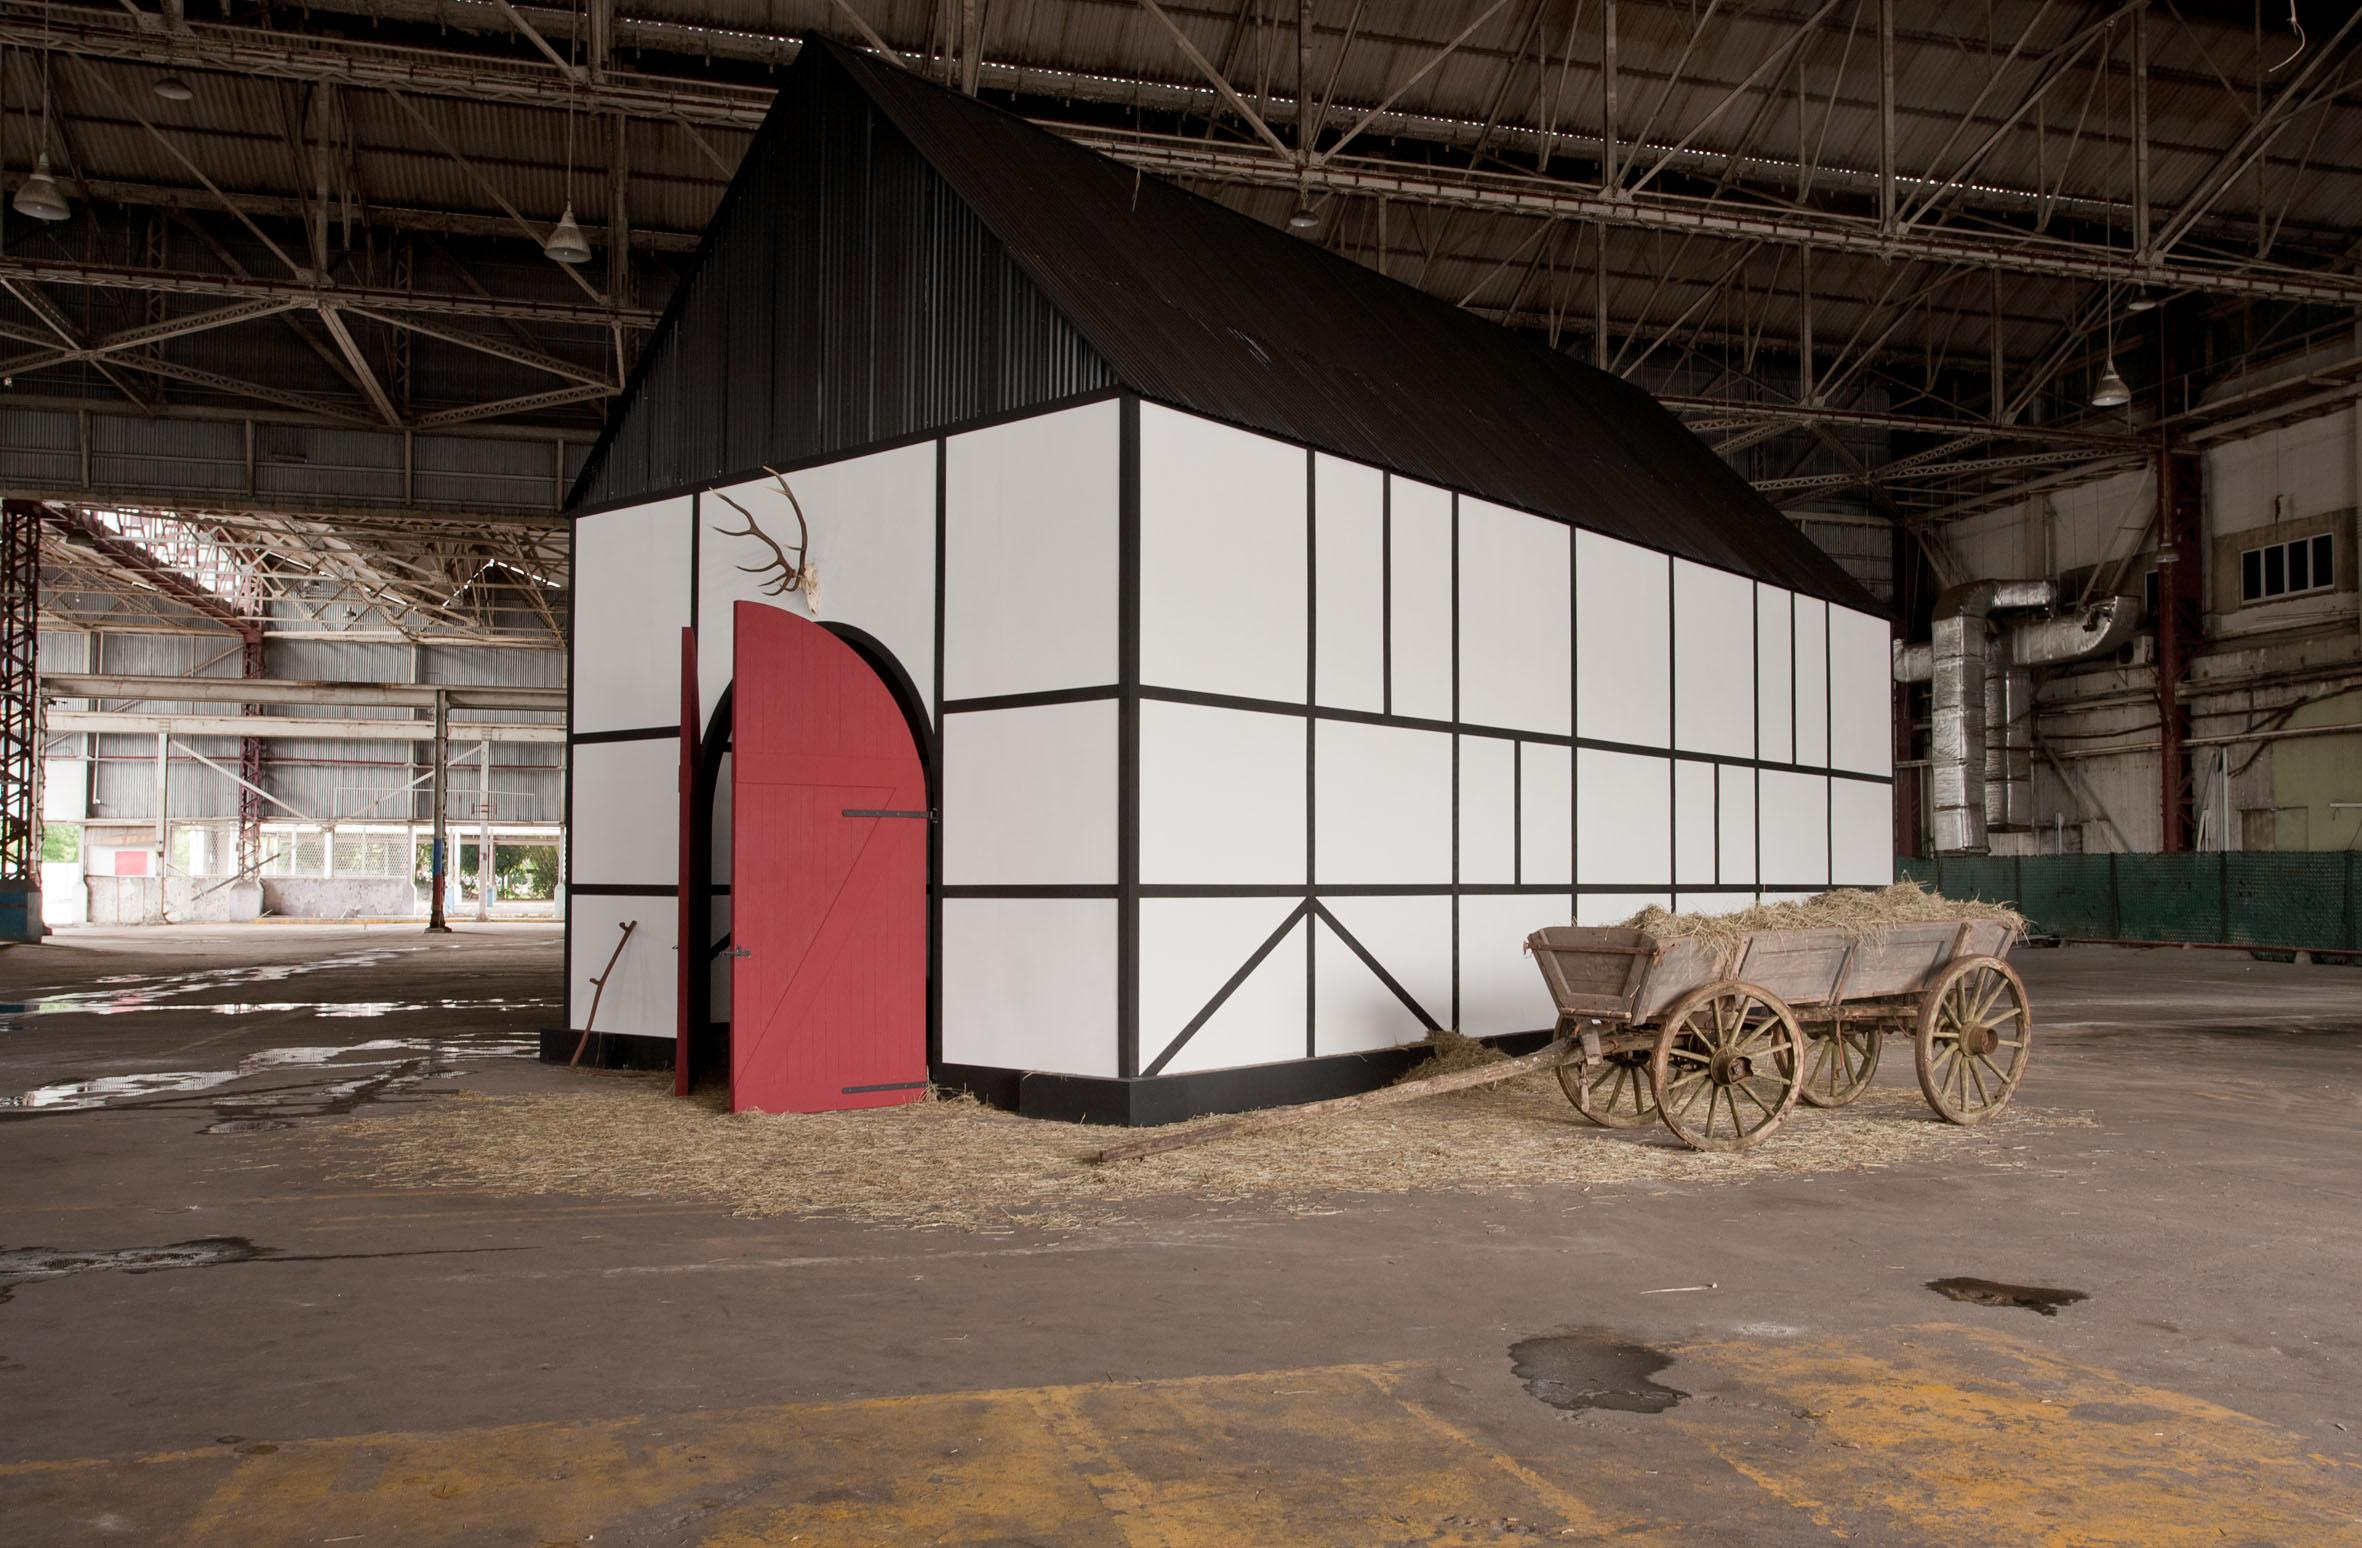 Deutsche Scheune / German Barn